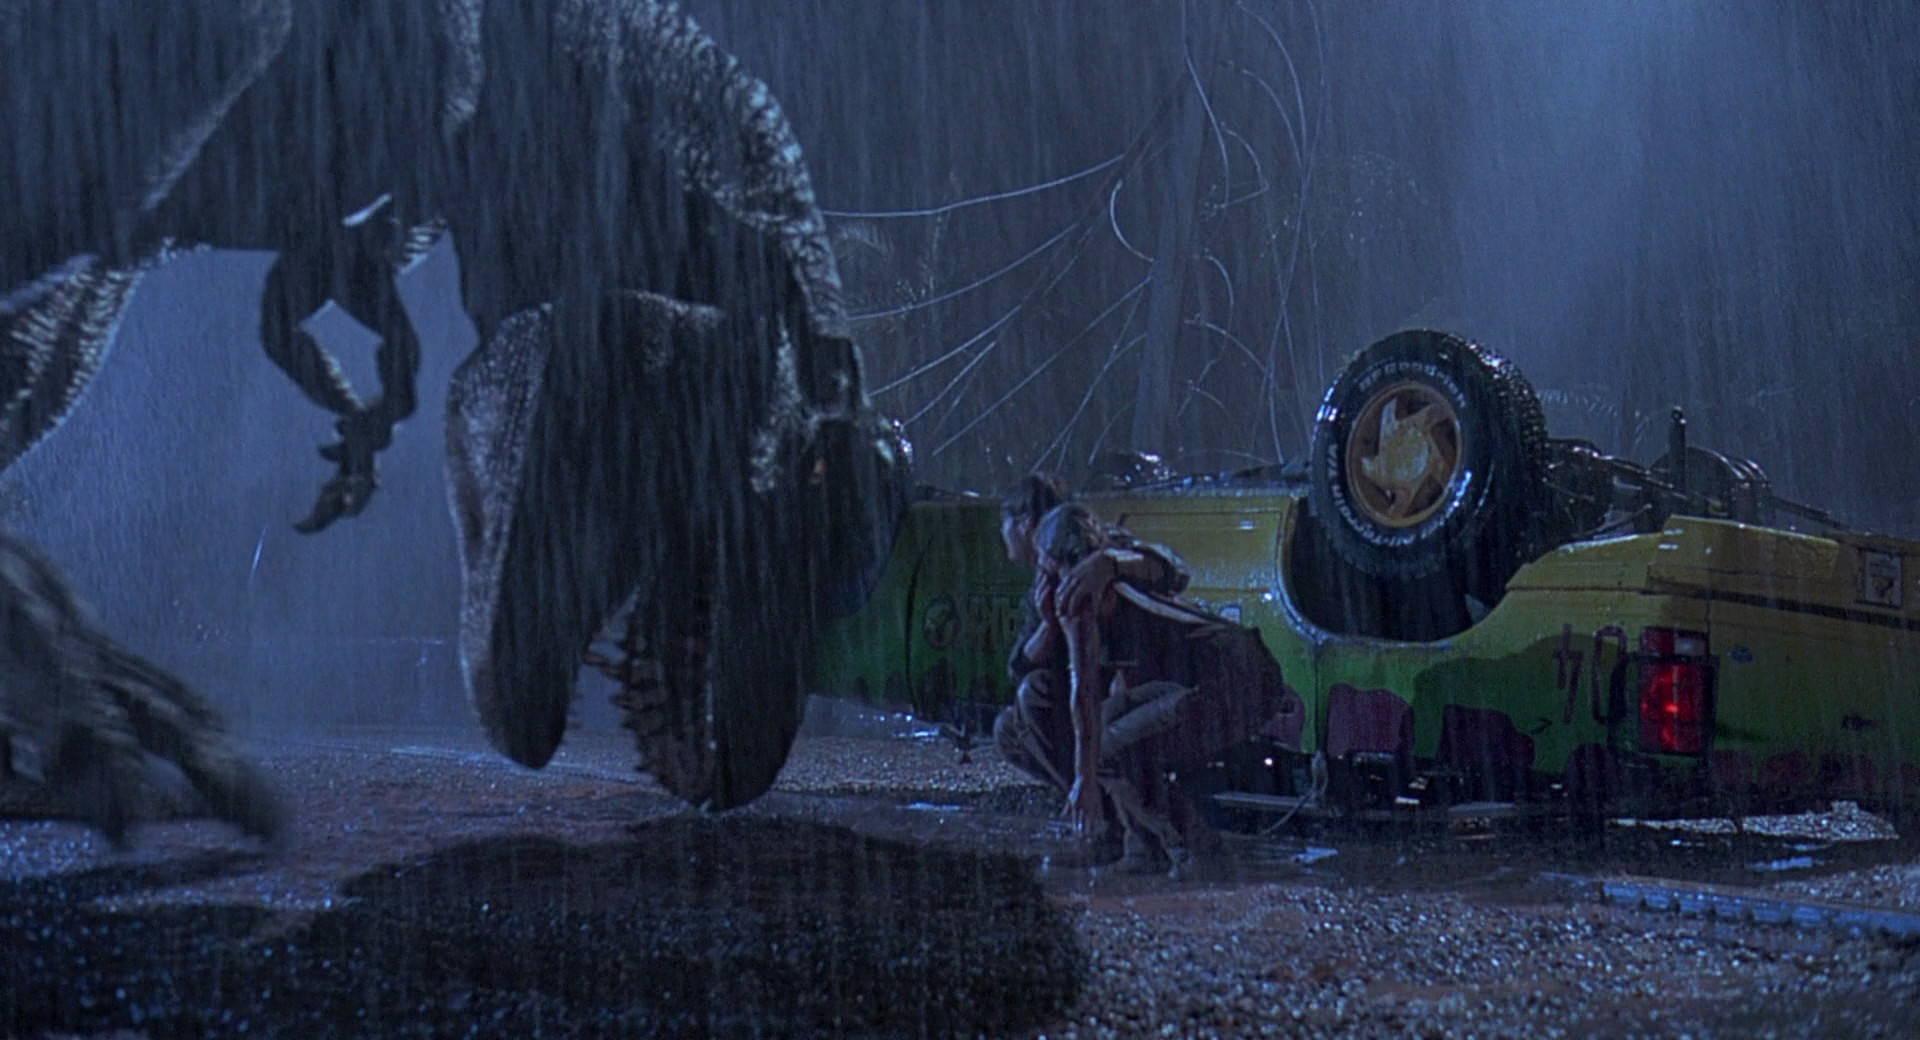 Jurassic Park, T-Rex - Exclamation Roar